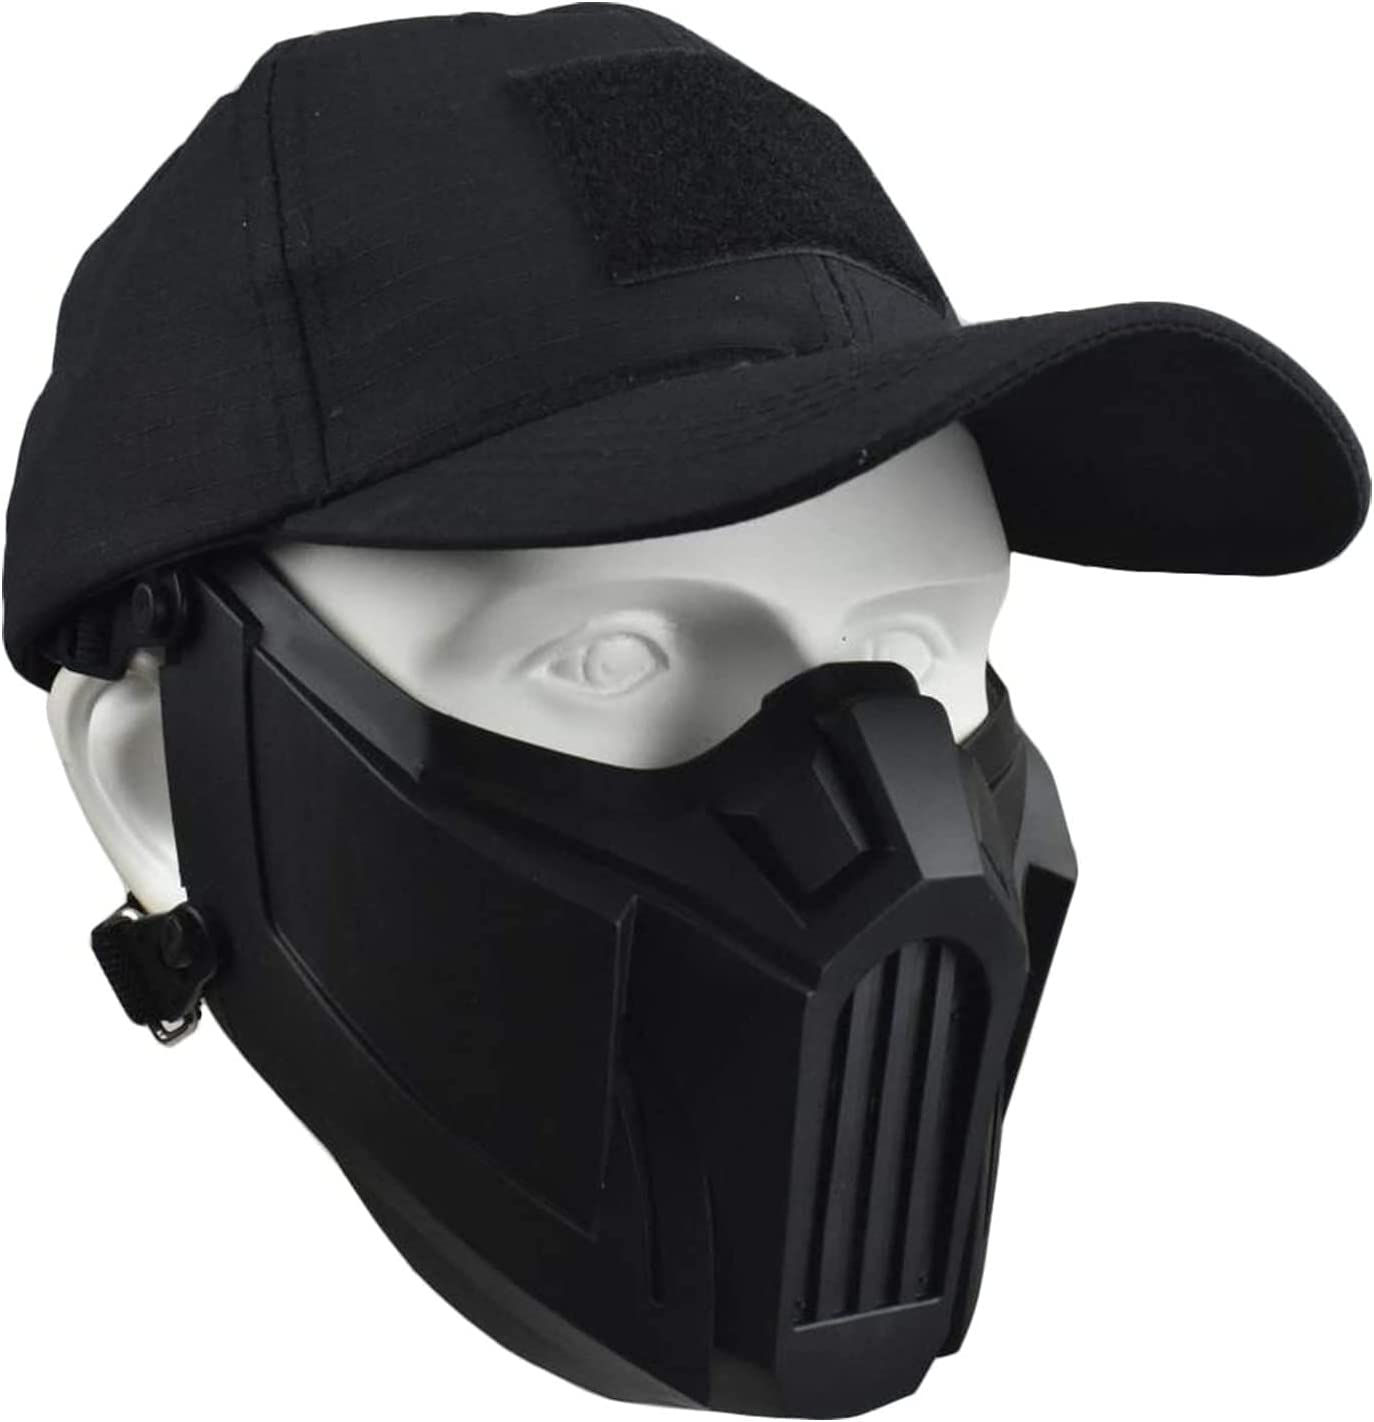 XBYN Mascarilla de Media Cara - Máscara de Malla de Airsoft con protección contra el oídos y Tapa de béisbol Ajustable para Airsoft/Paintball/BB Gun/CS Juego/Caza/Disparos (Color : Black A)